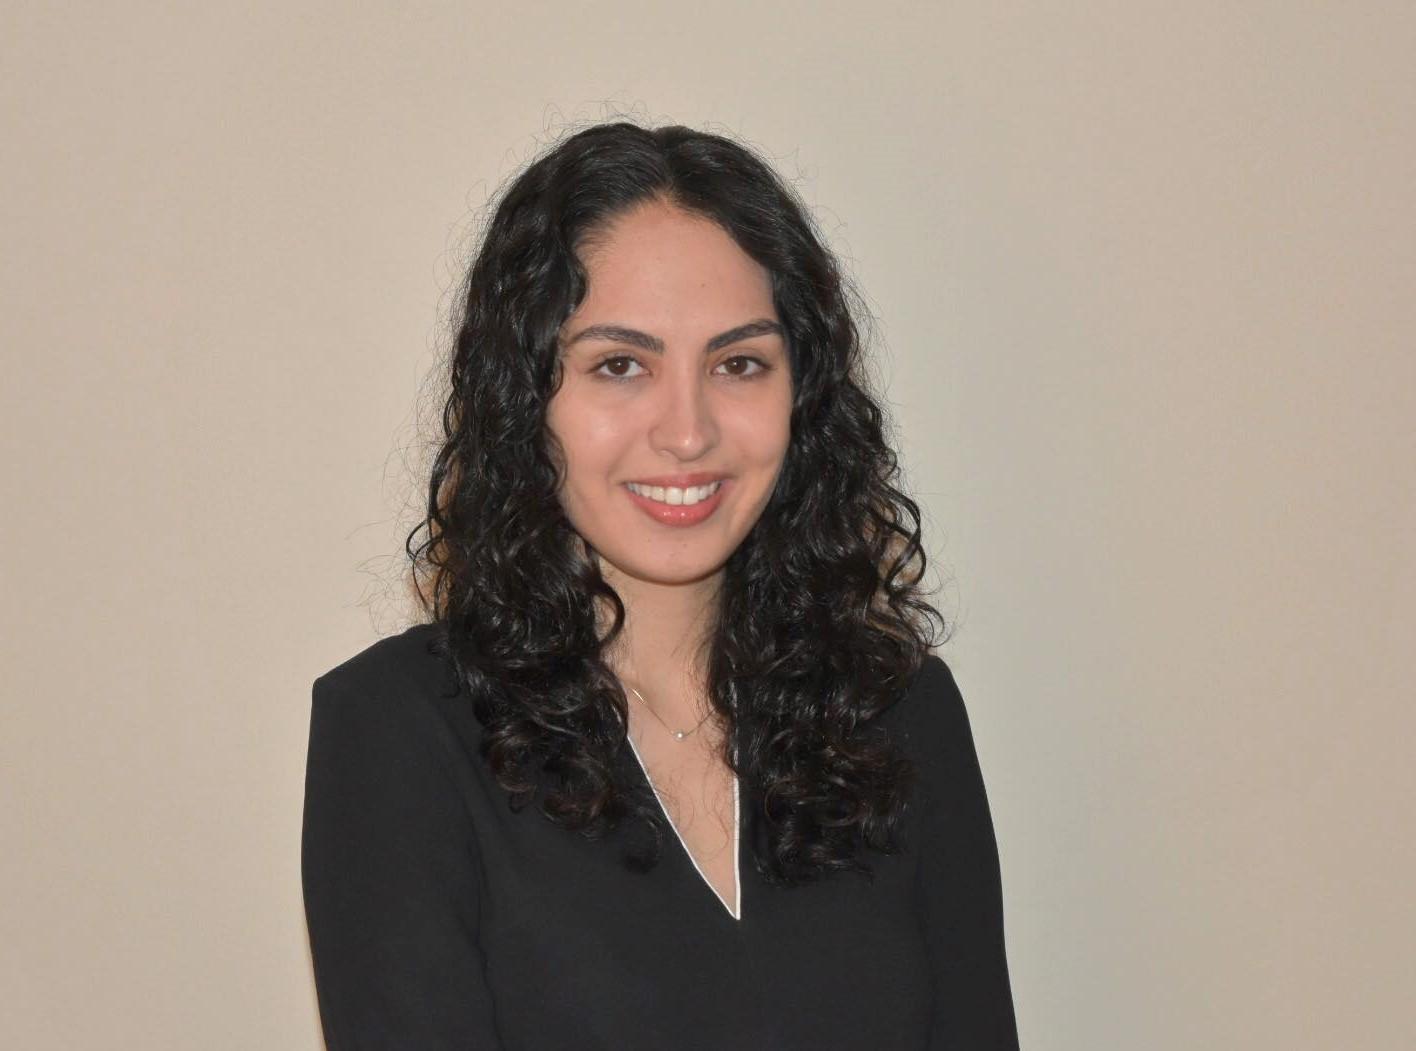 Niki Jafari